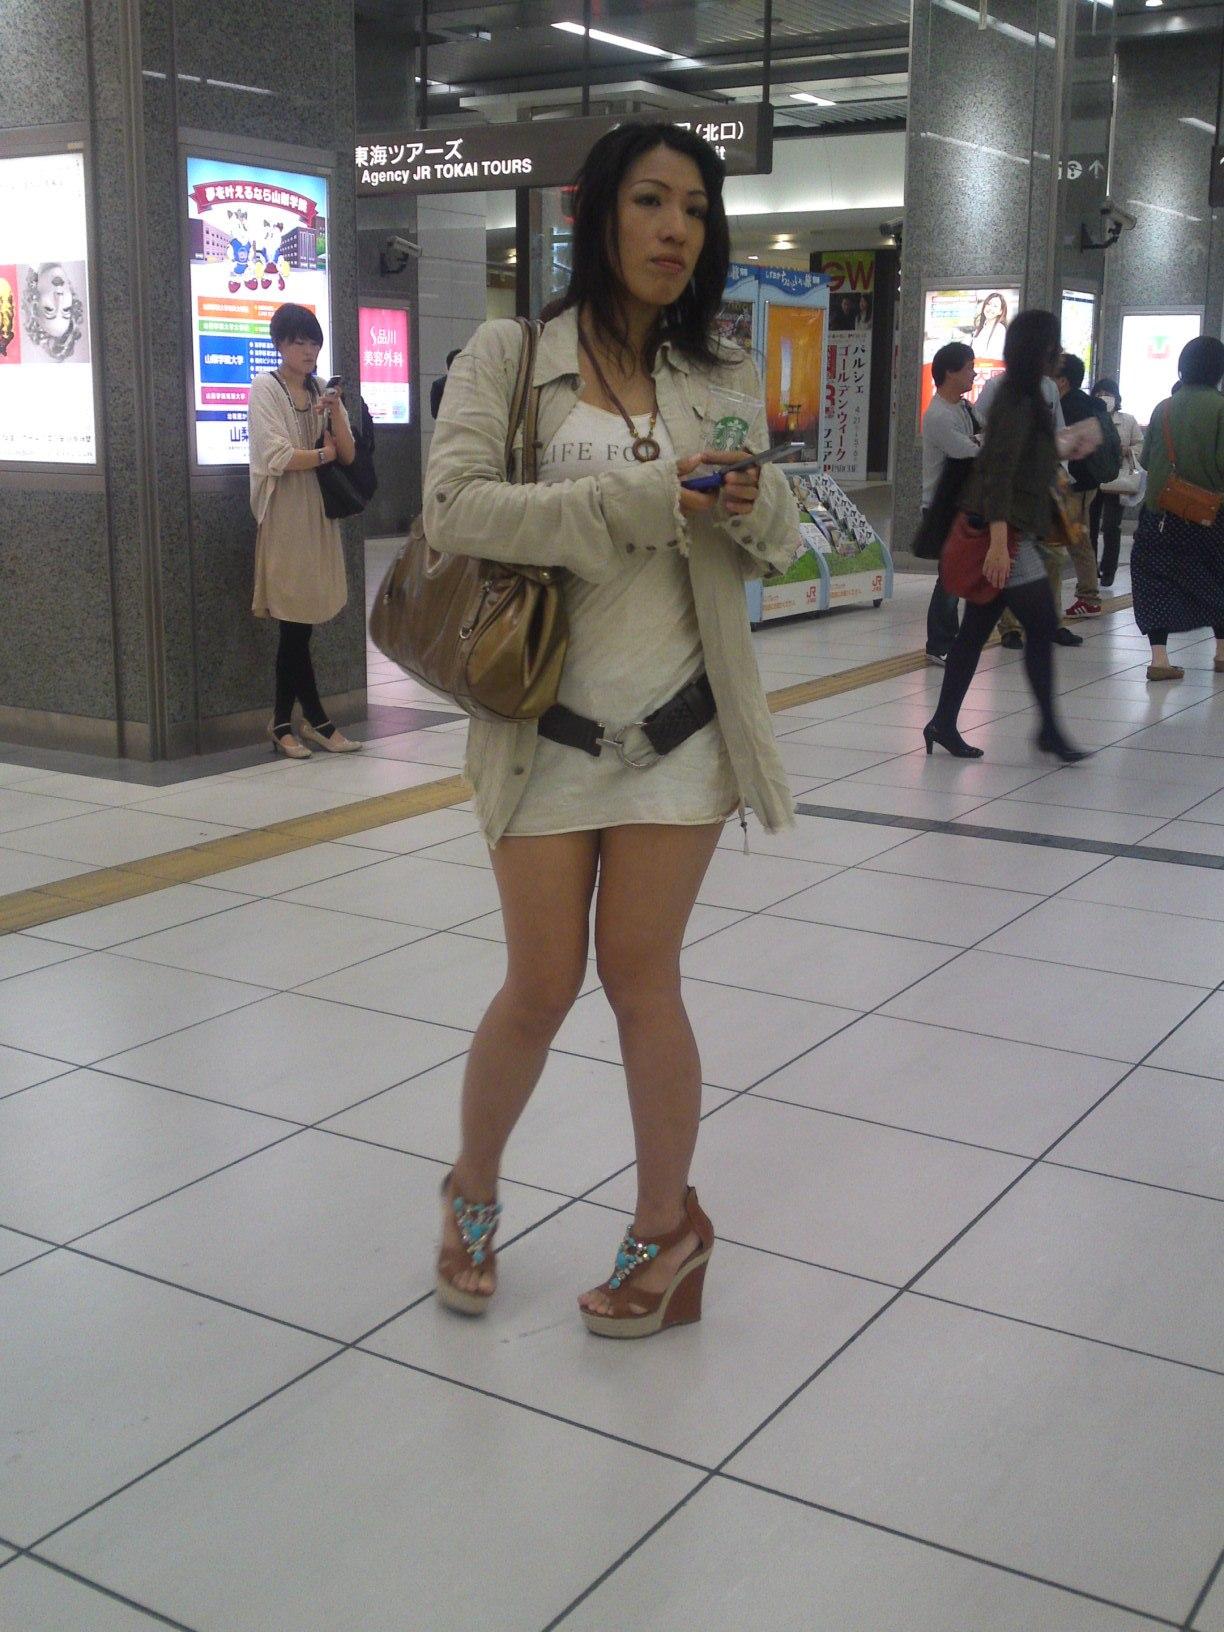 Japan Legs - Lesbian Pantyhose Sex